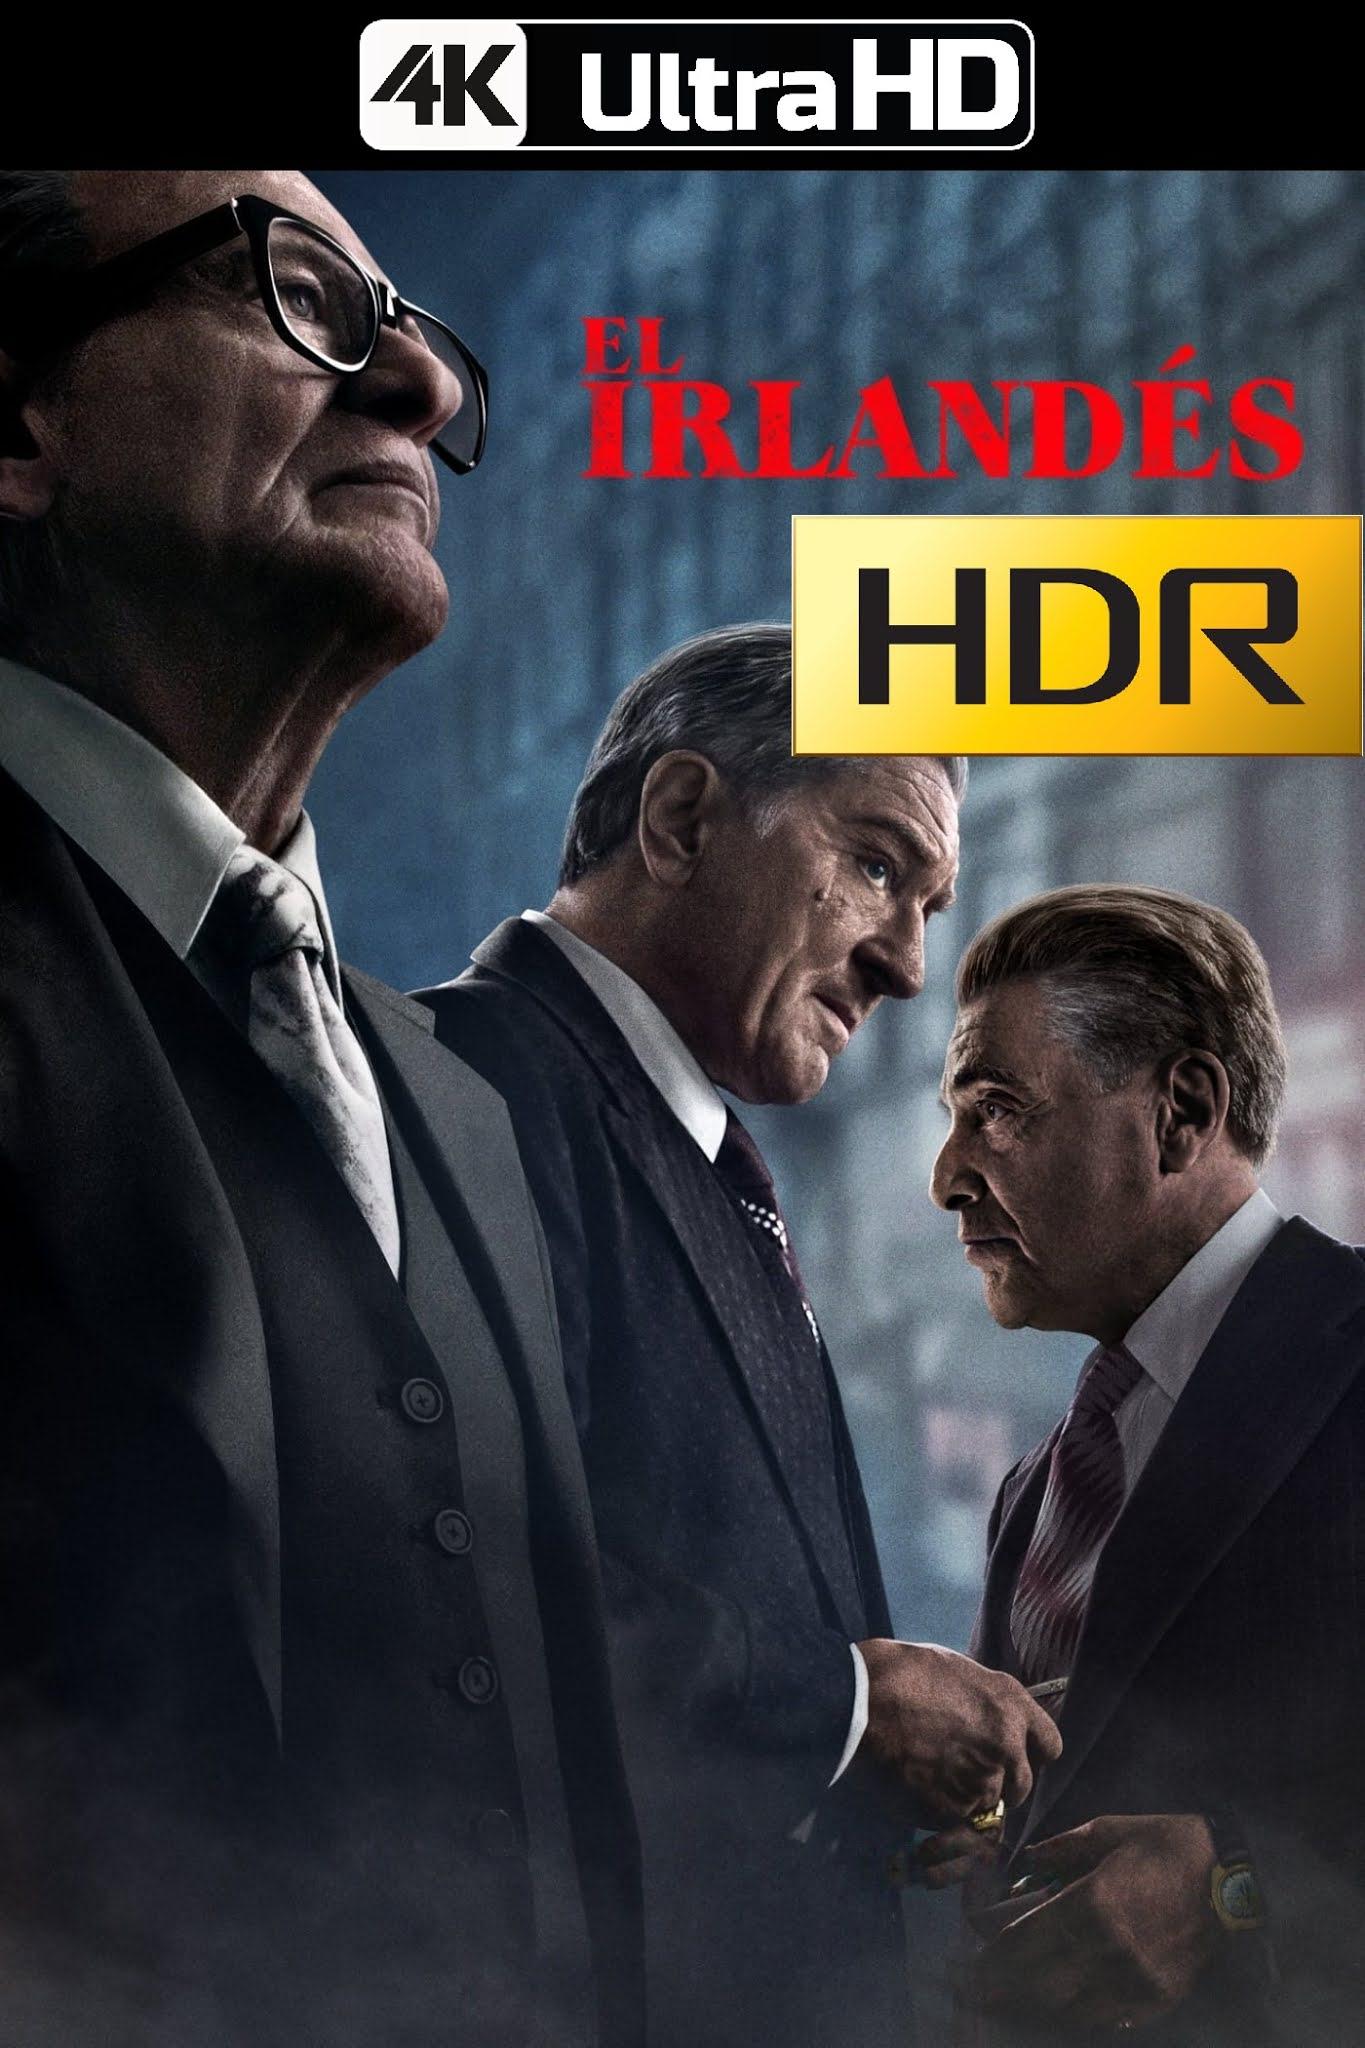 El irlandés (2019) 4K UHD HDR Web-DL Latino